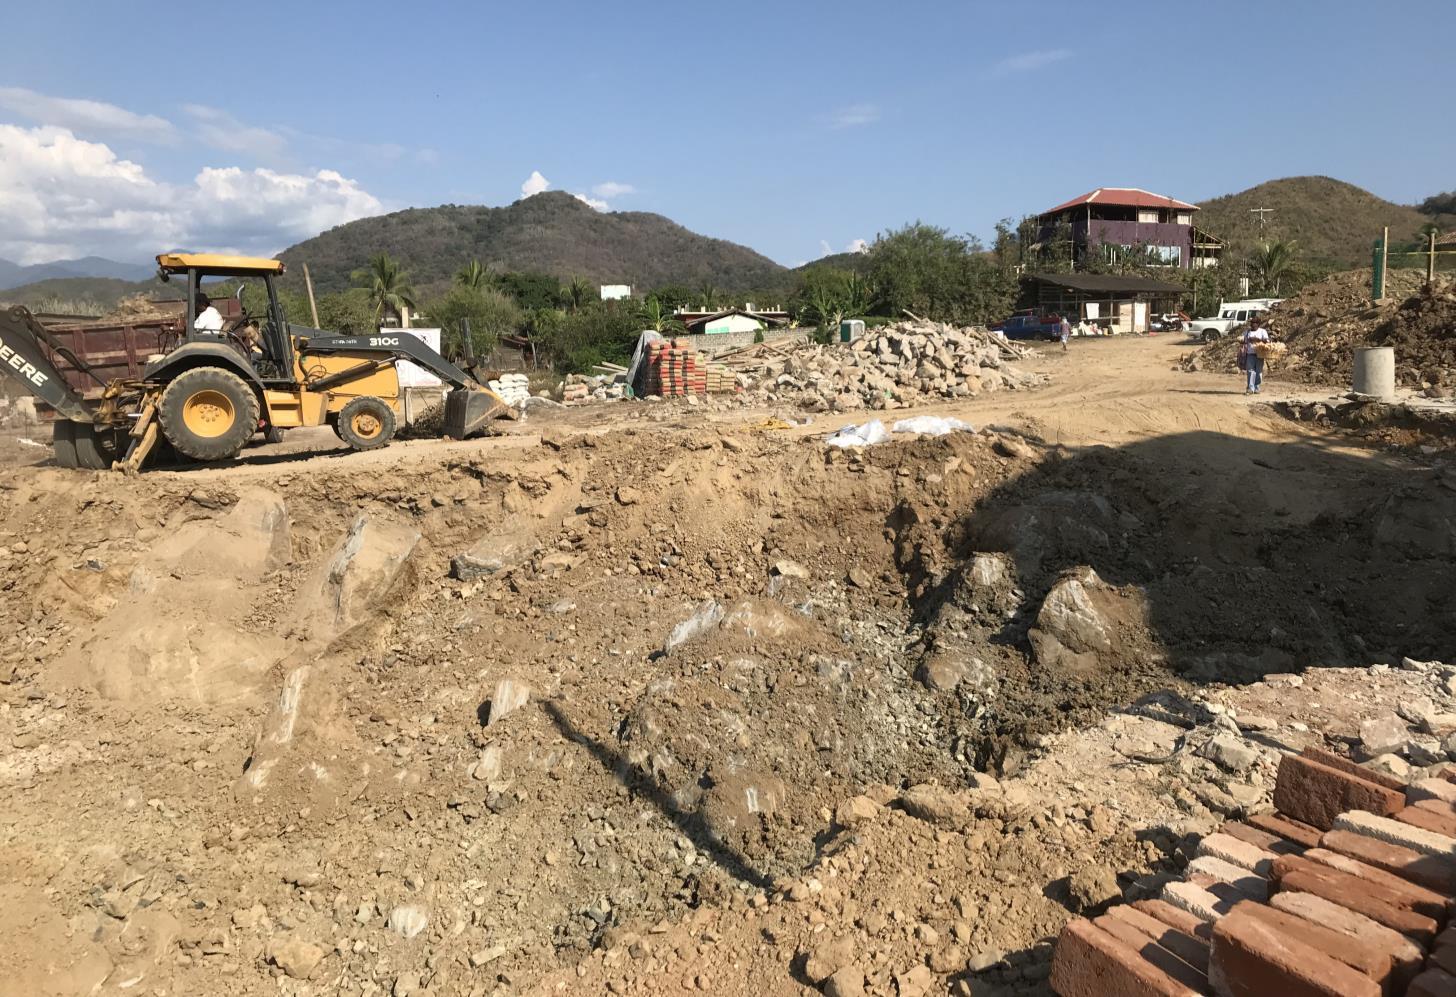 REPORTE-FOTOGRAFICO-PUNTA-MAJAHUA-09-DE-FEBRERO-DEL-2018-053.jpg